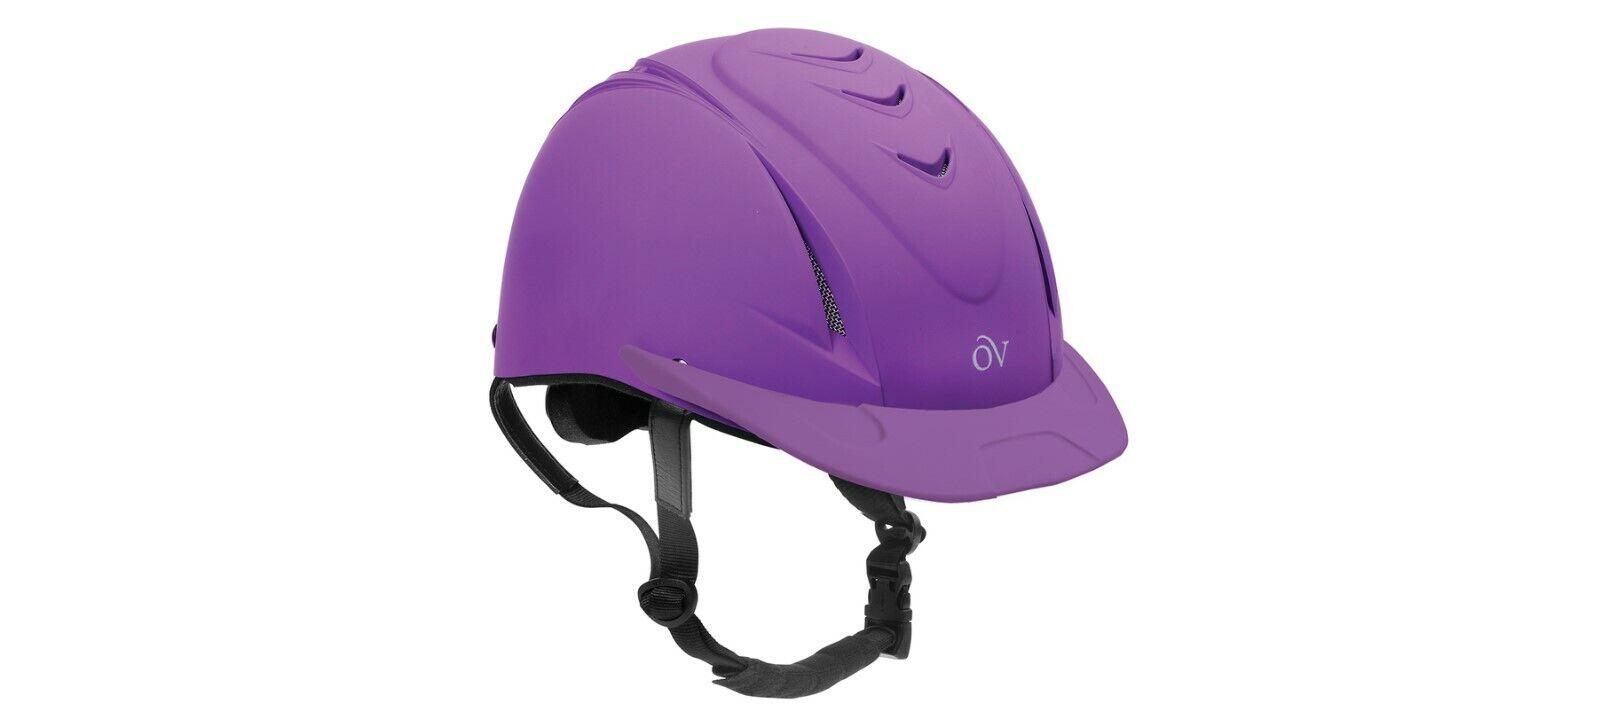 NEW Ovation Deluxe Schooler Helmet -  Small   Medium - Purple  store